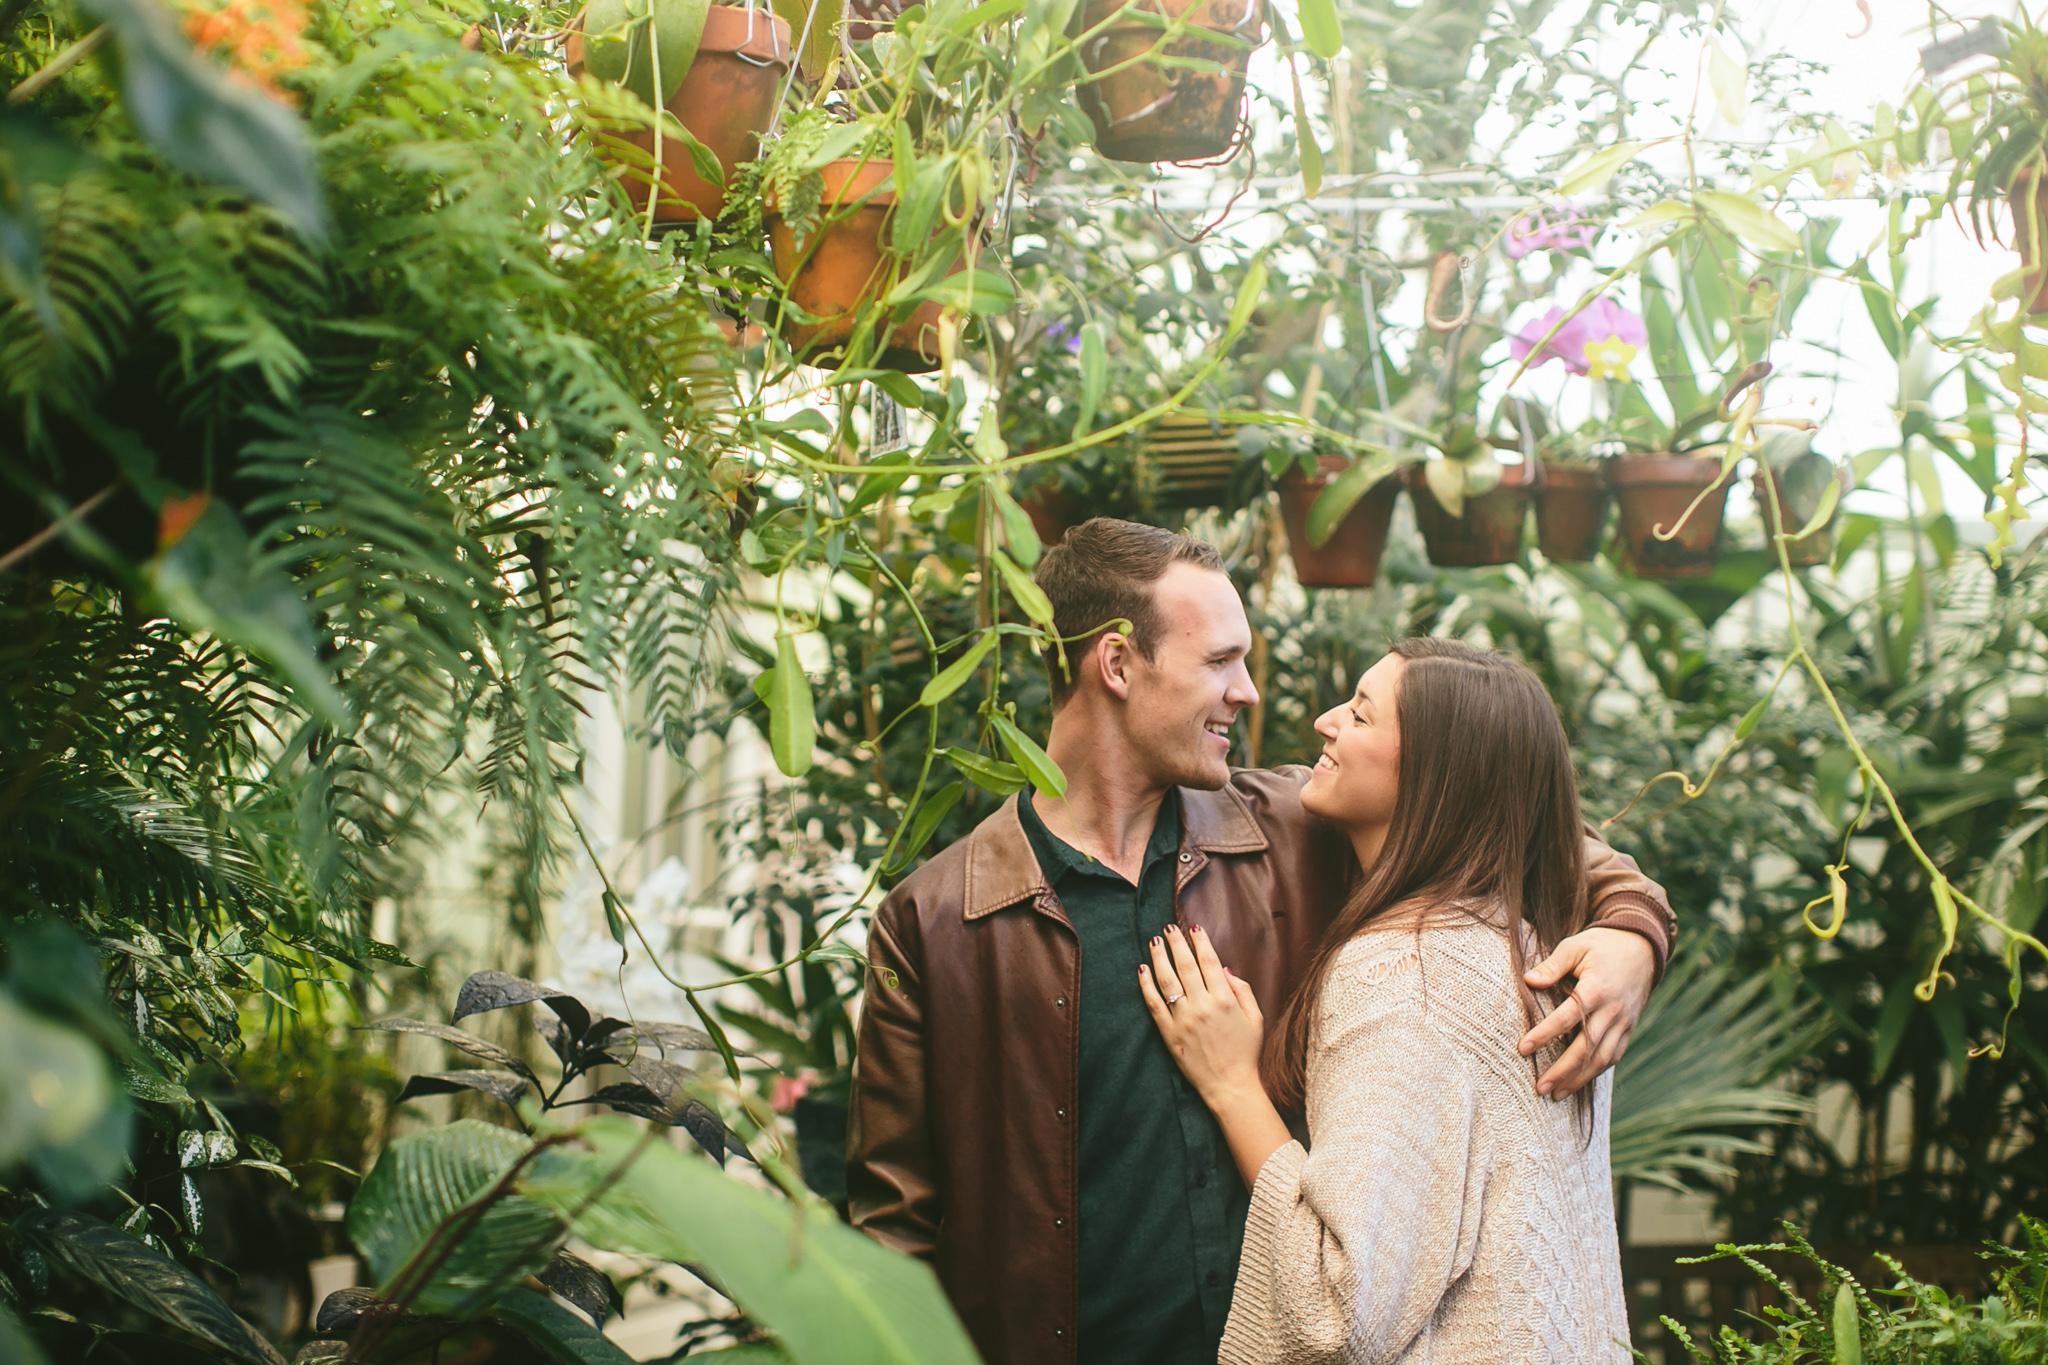 Sunee+Adam-Proposal-KellyBoitanoPhotography_WEB20151229_0037